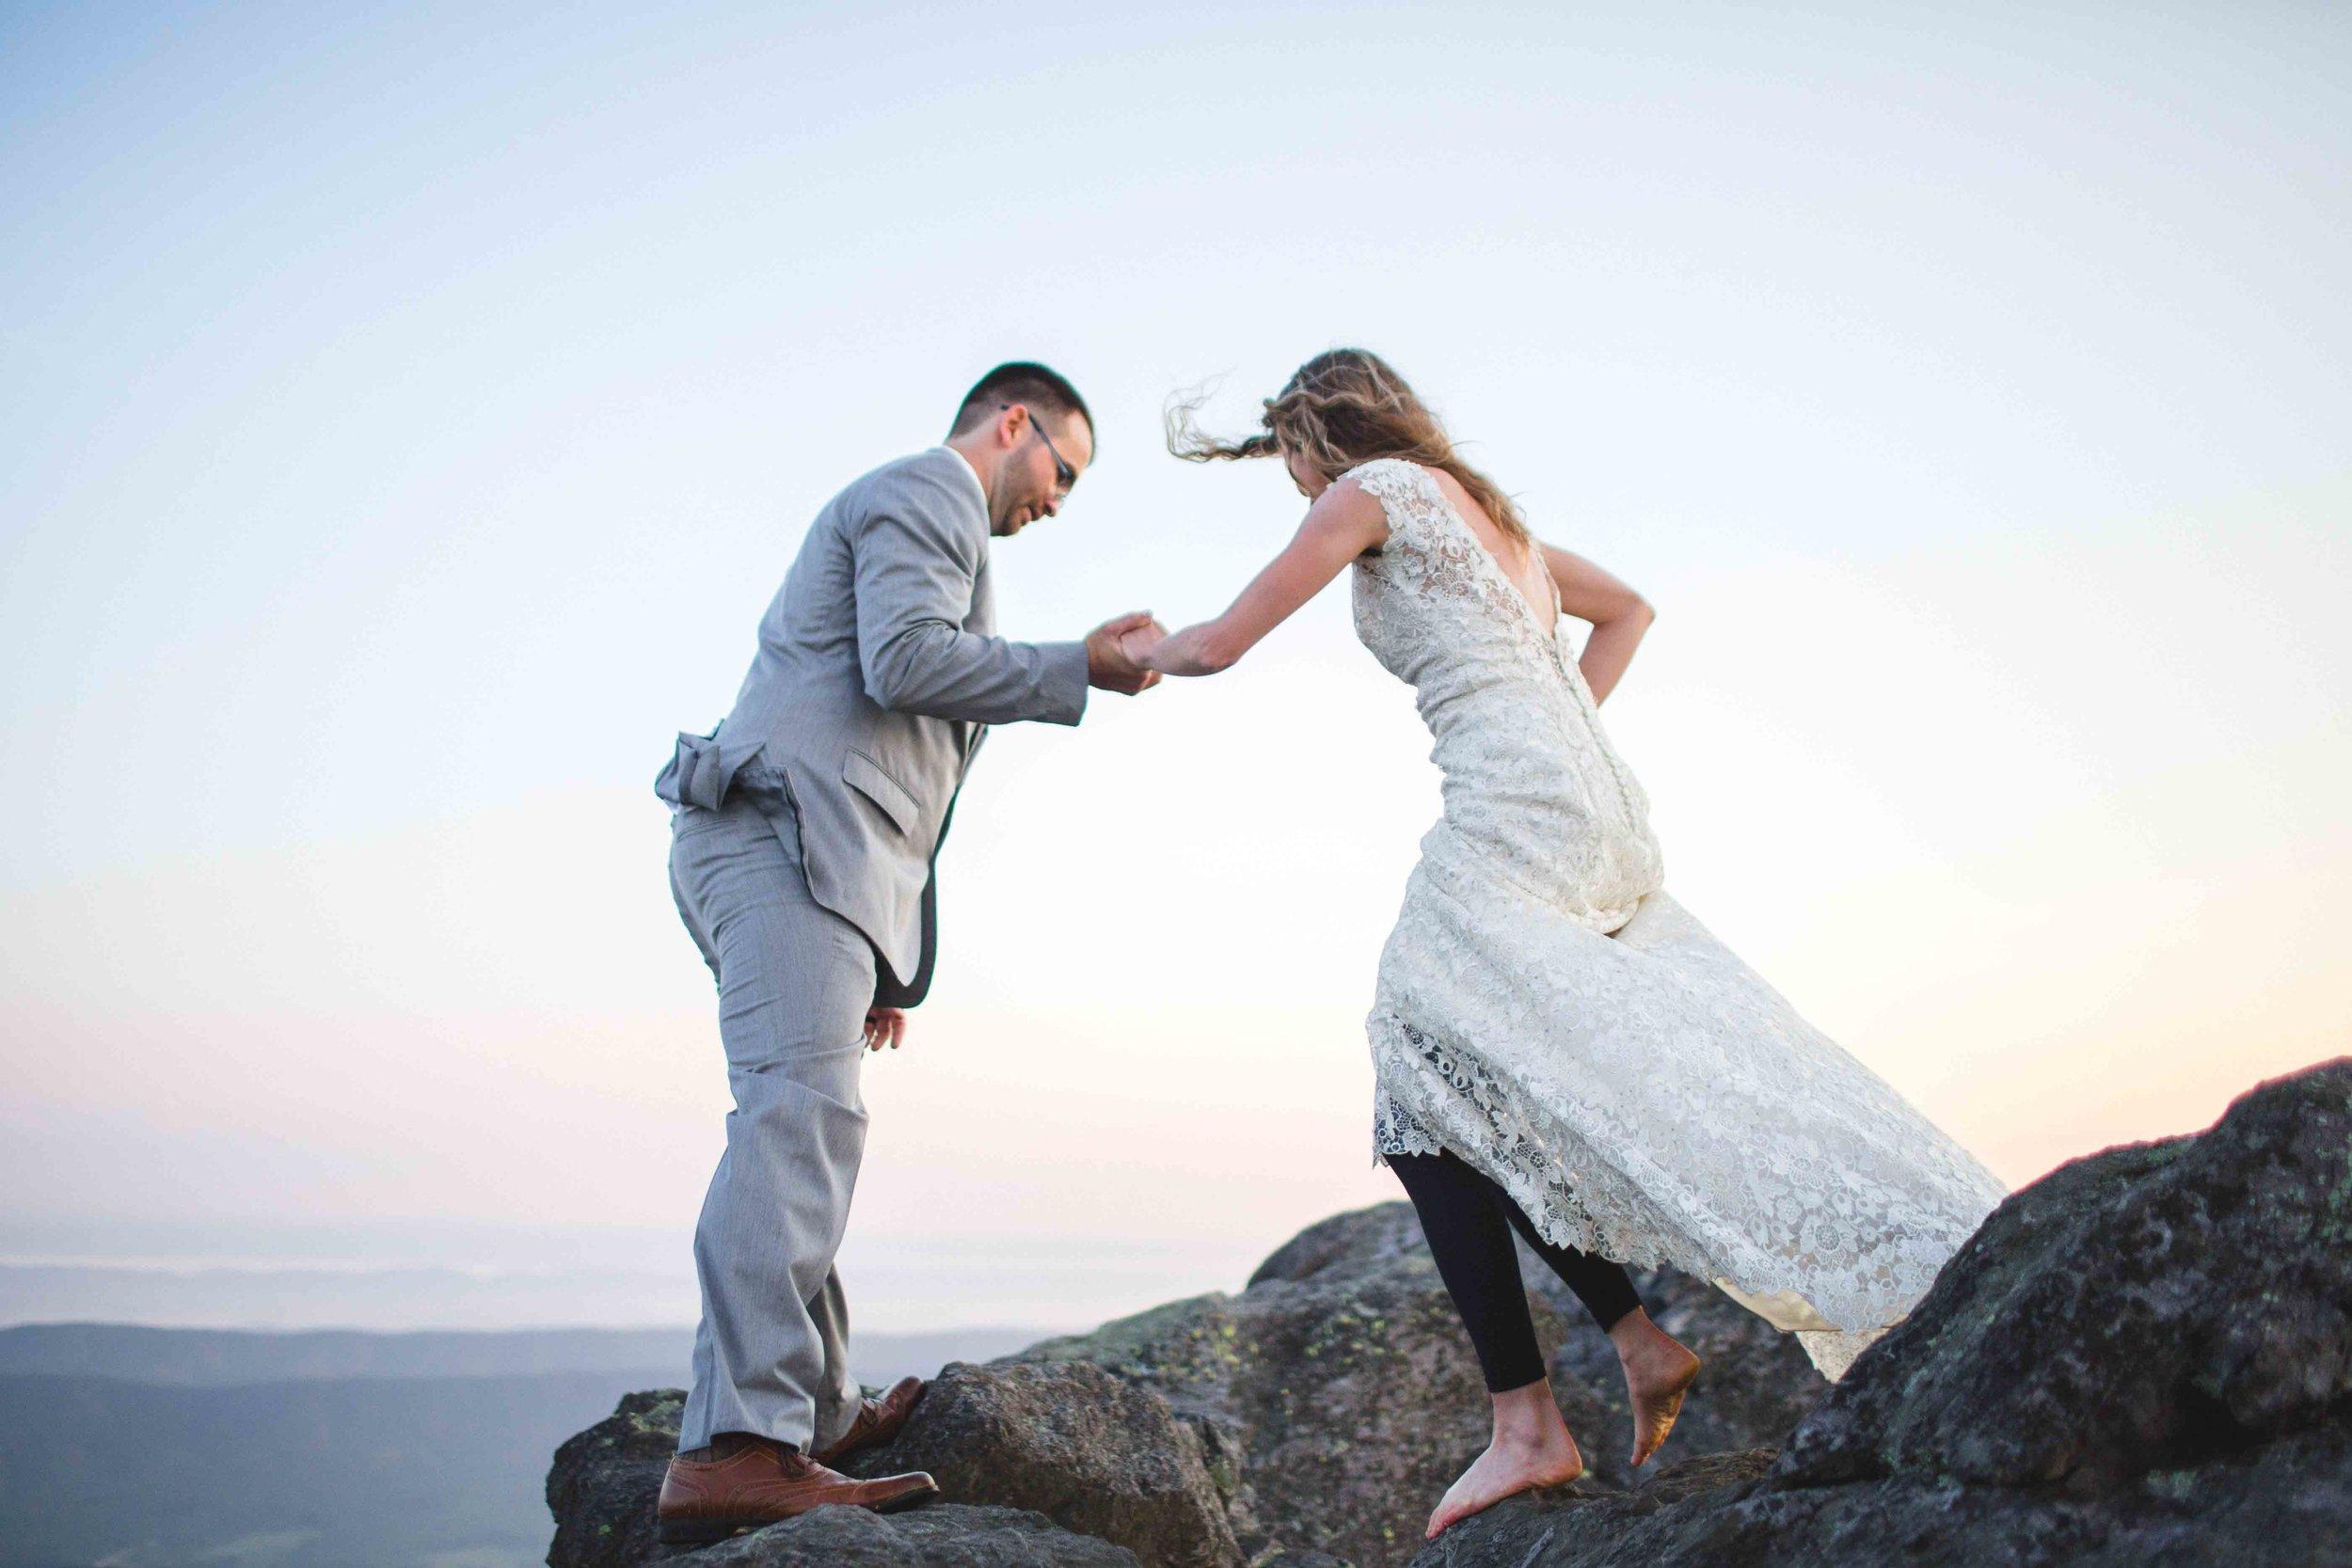 north-carolina-elopement-photographer-49.jpg